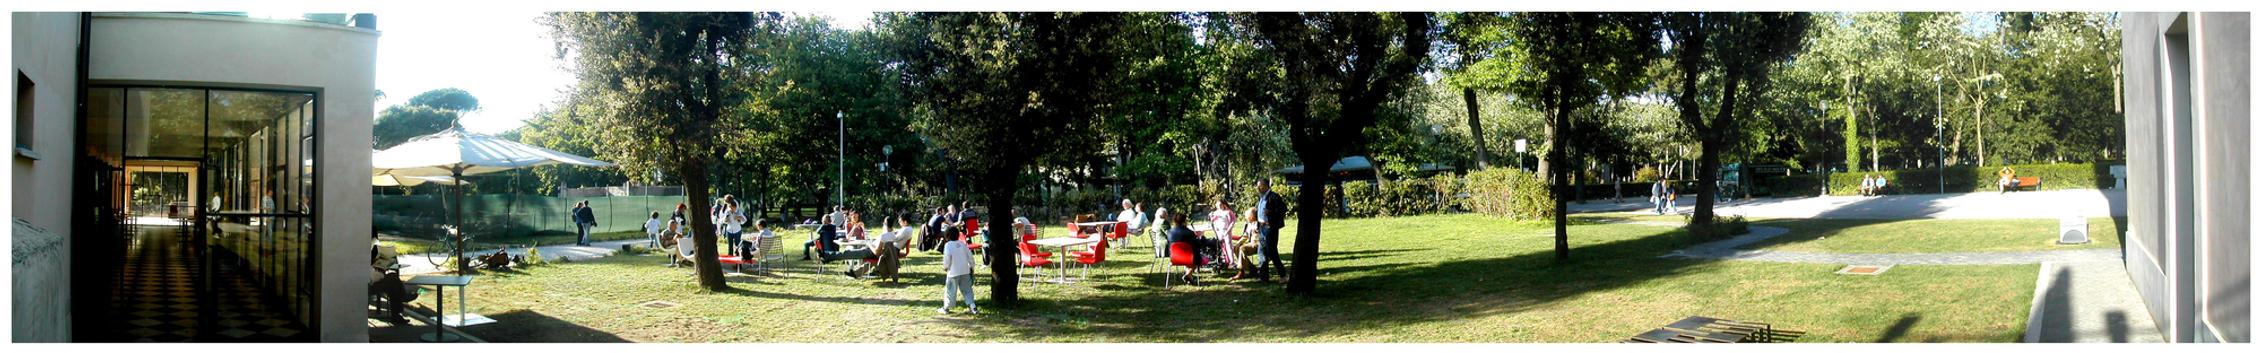 palombini at villa borghese by prikedelik